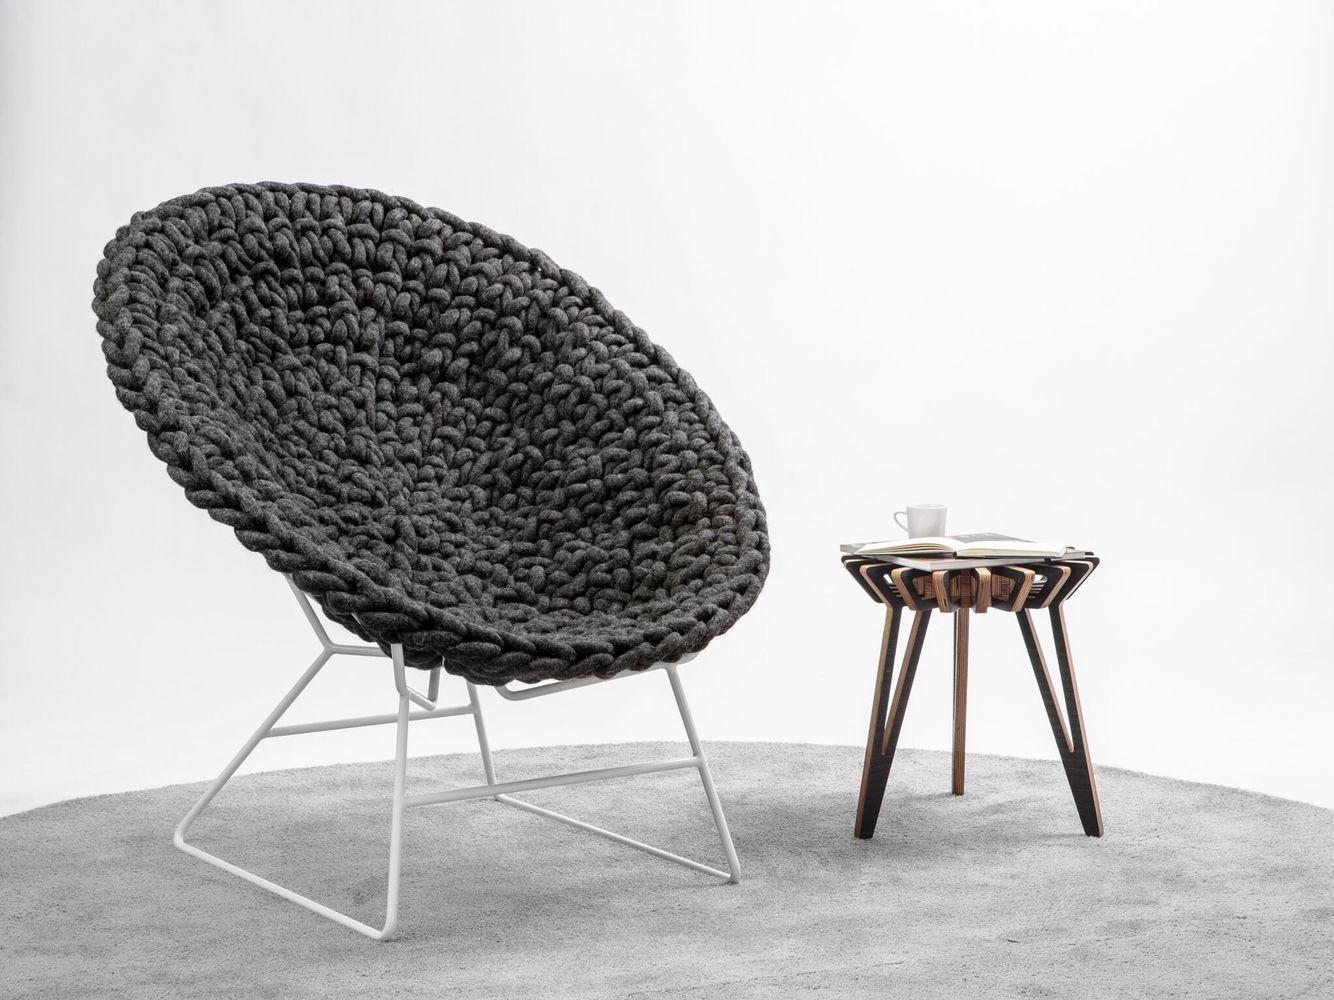 Lana Chair @MR Design @LATI-NOS